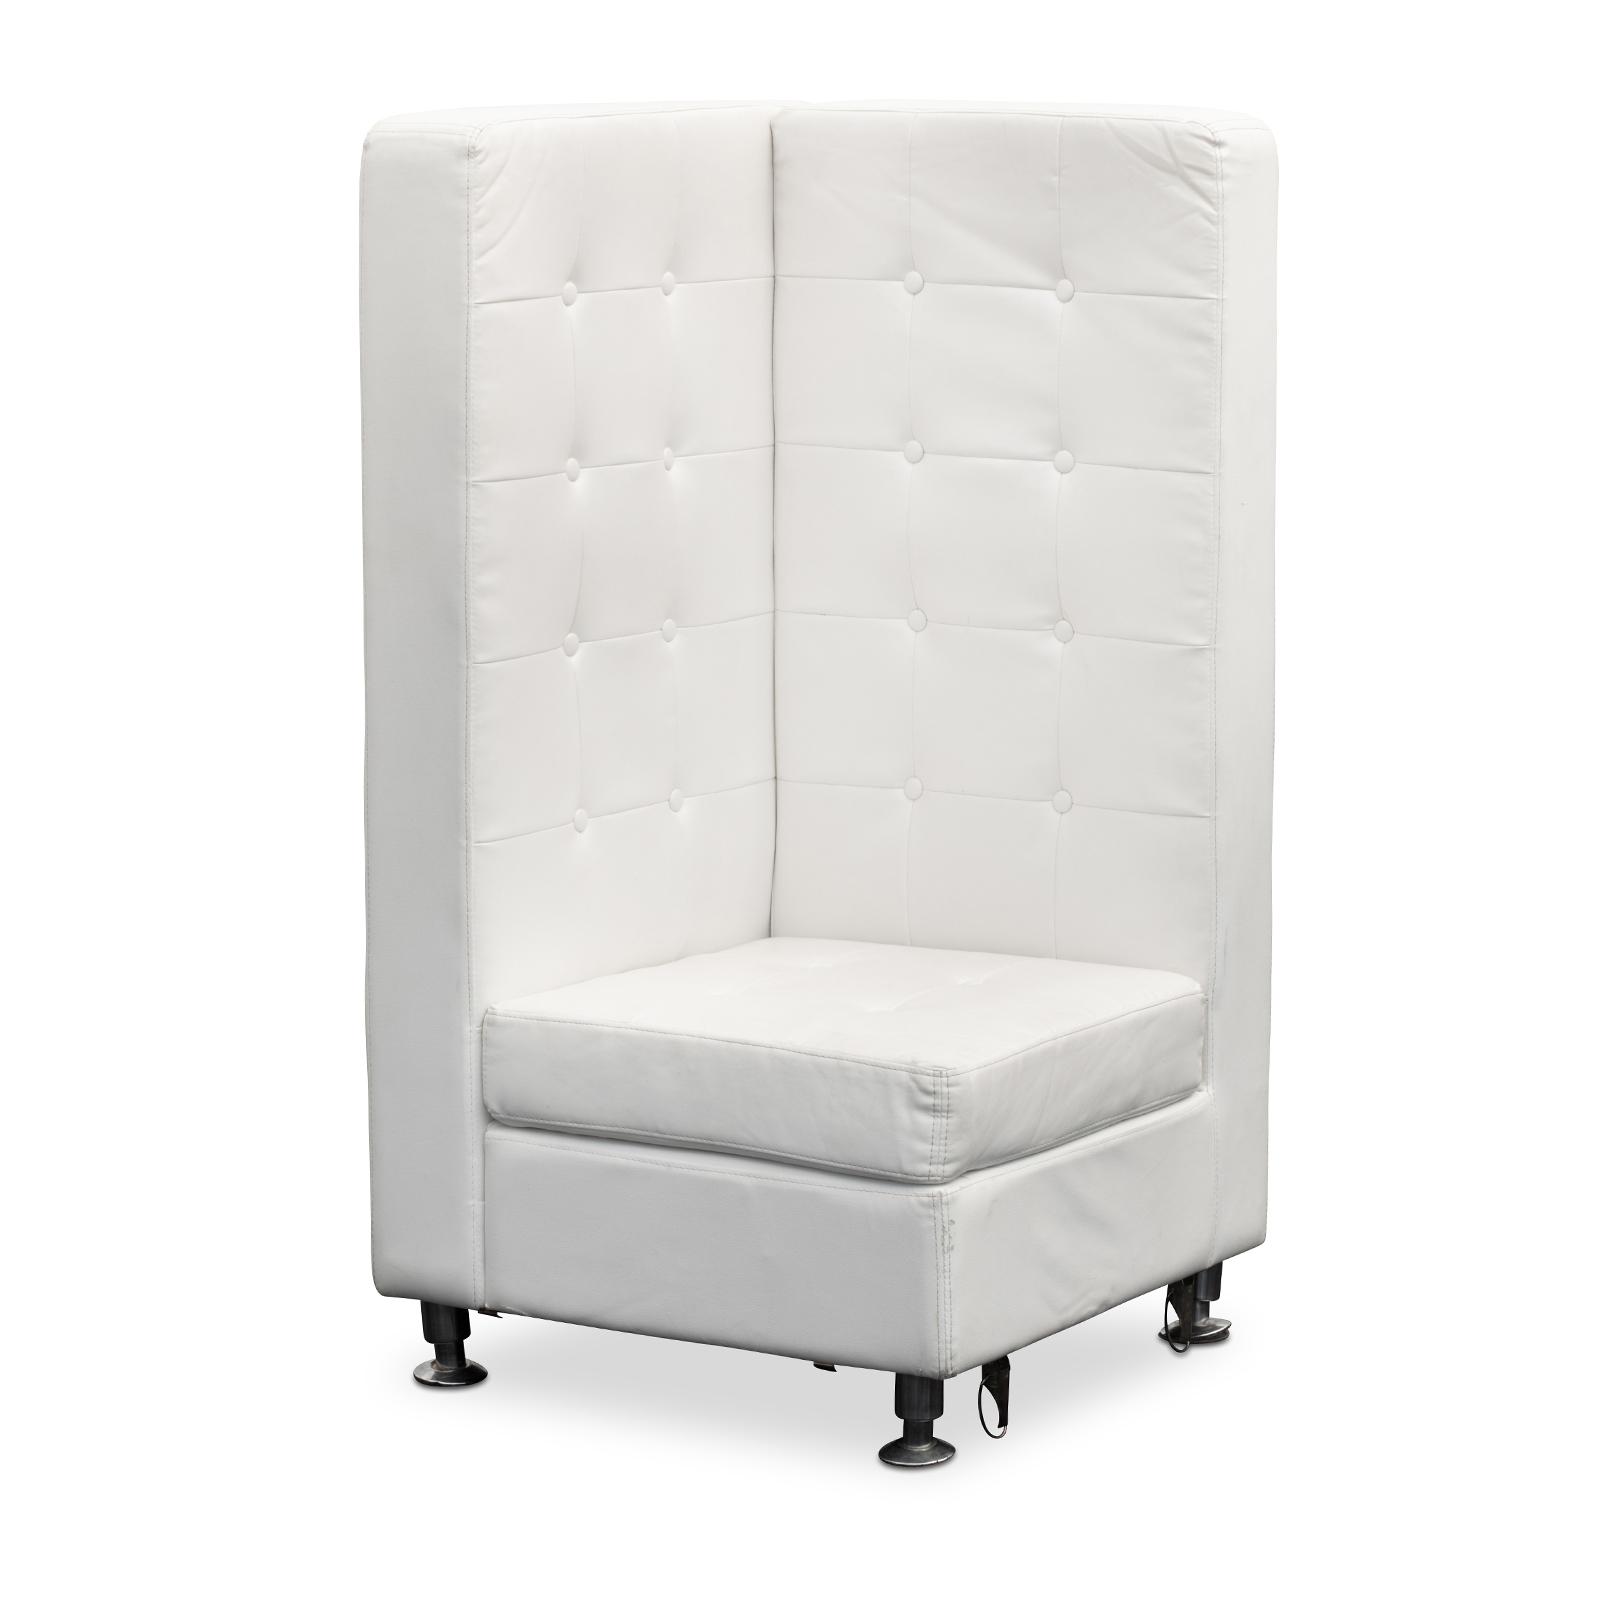 Lounge Furniture : HIGH BACK TUFTED SOFA, CORNER, WHITE ...